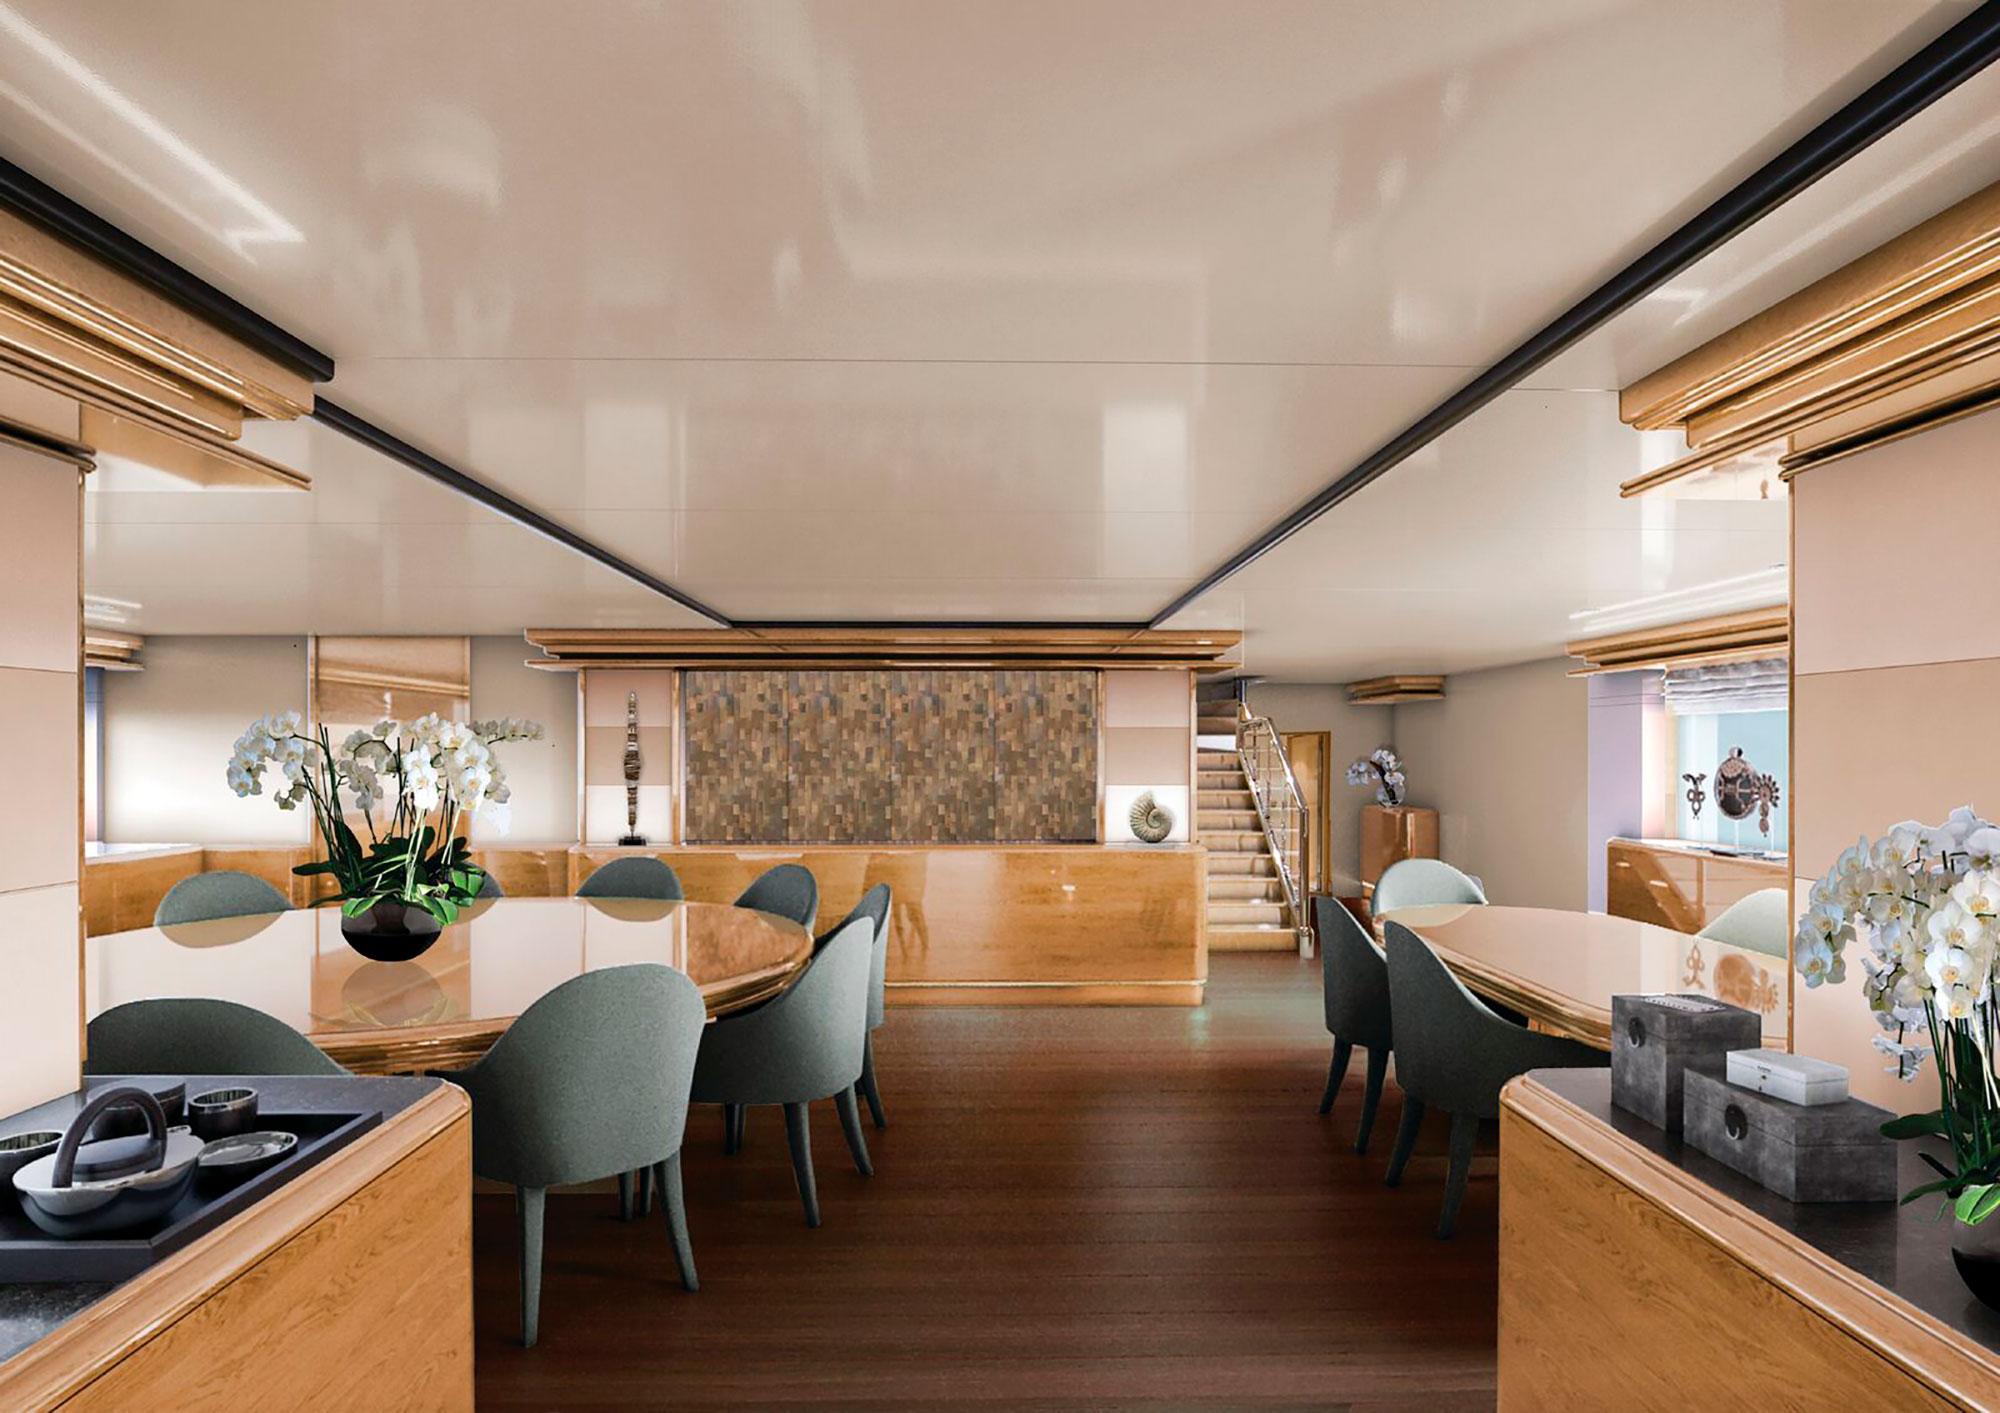 Crucero AQUA BLU de 12 noches - Viaje Inaugural - Bali to Flores - Indonesia- imagen #1